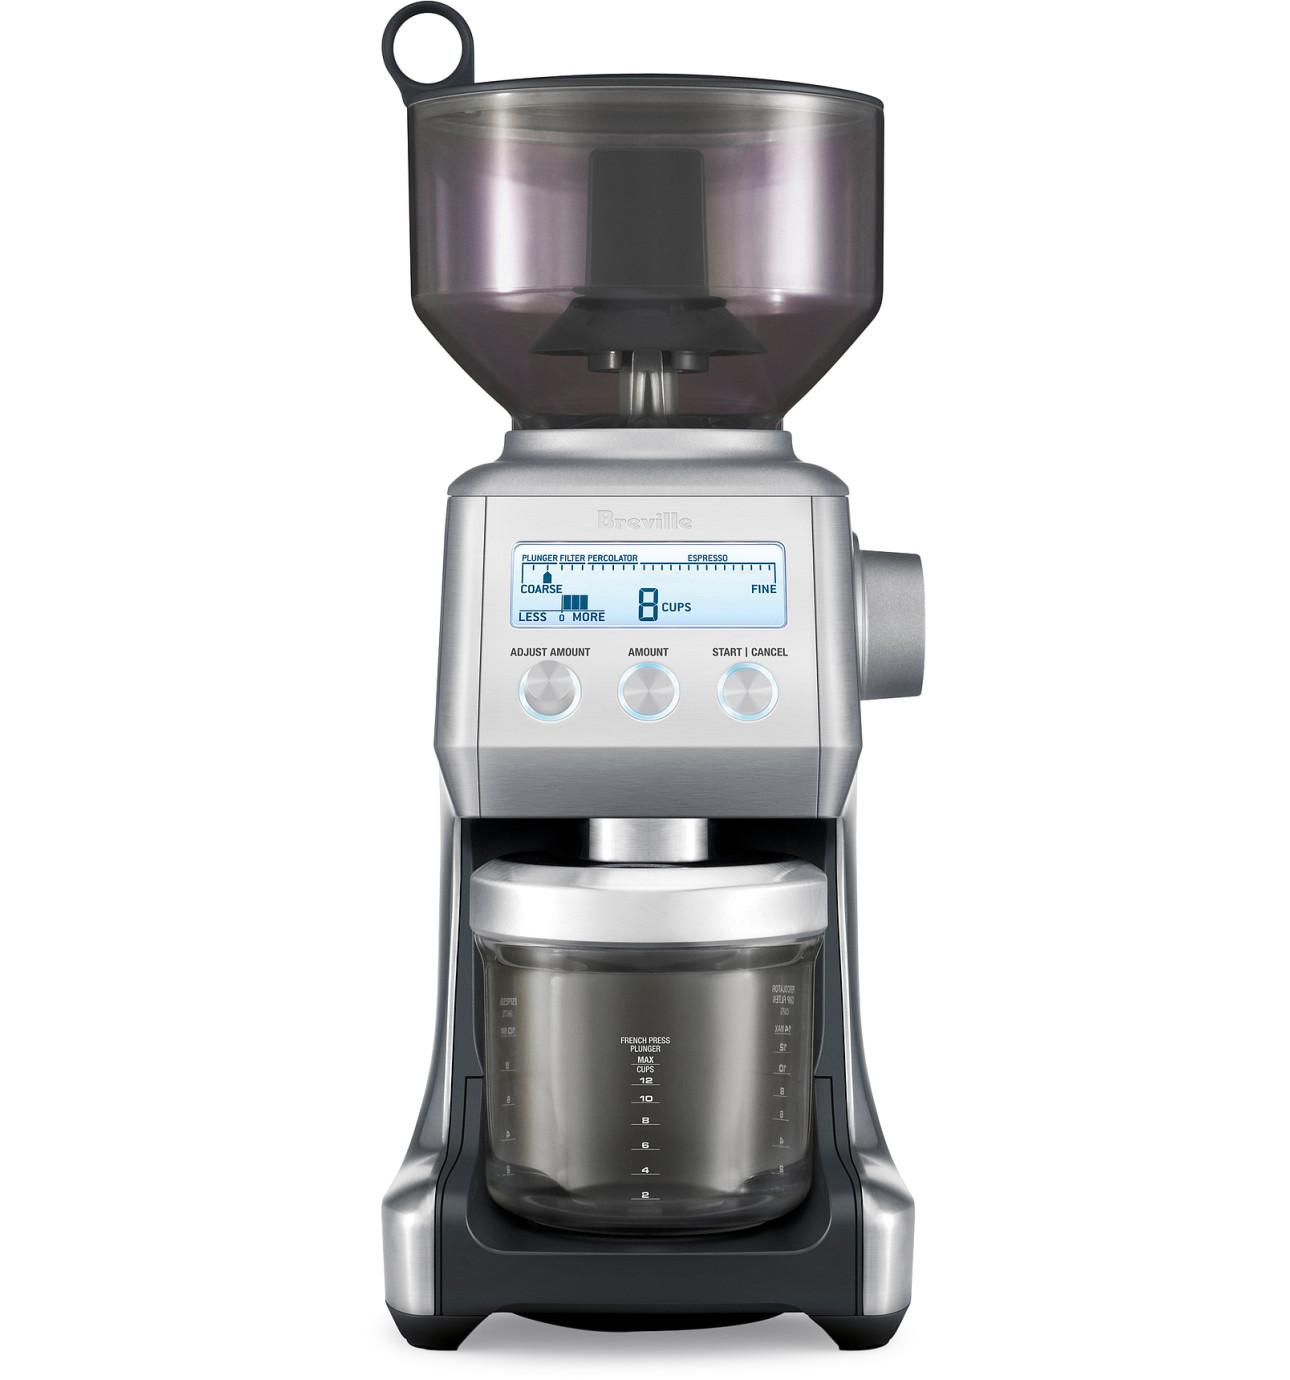 Electronic David Jones Coffee Machines david jones coffee machines grinders delonghi smart grinder digital grinder